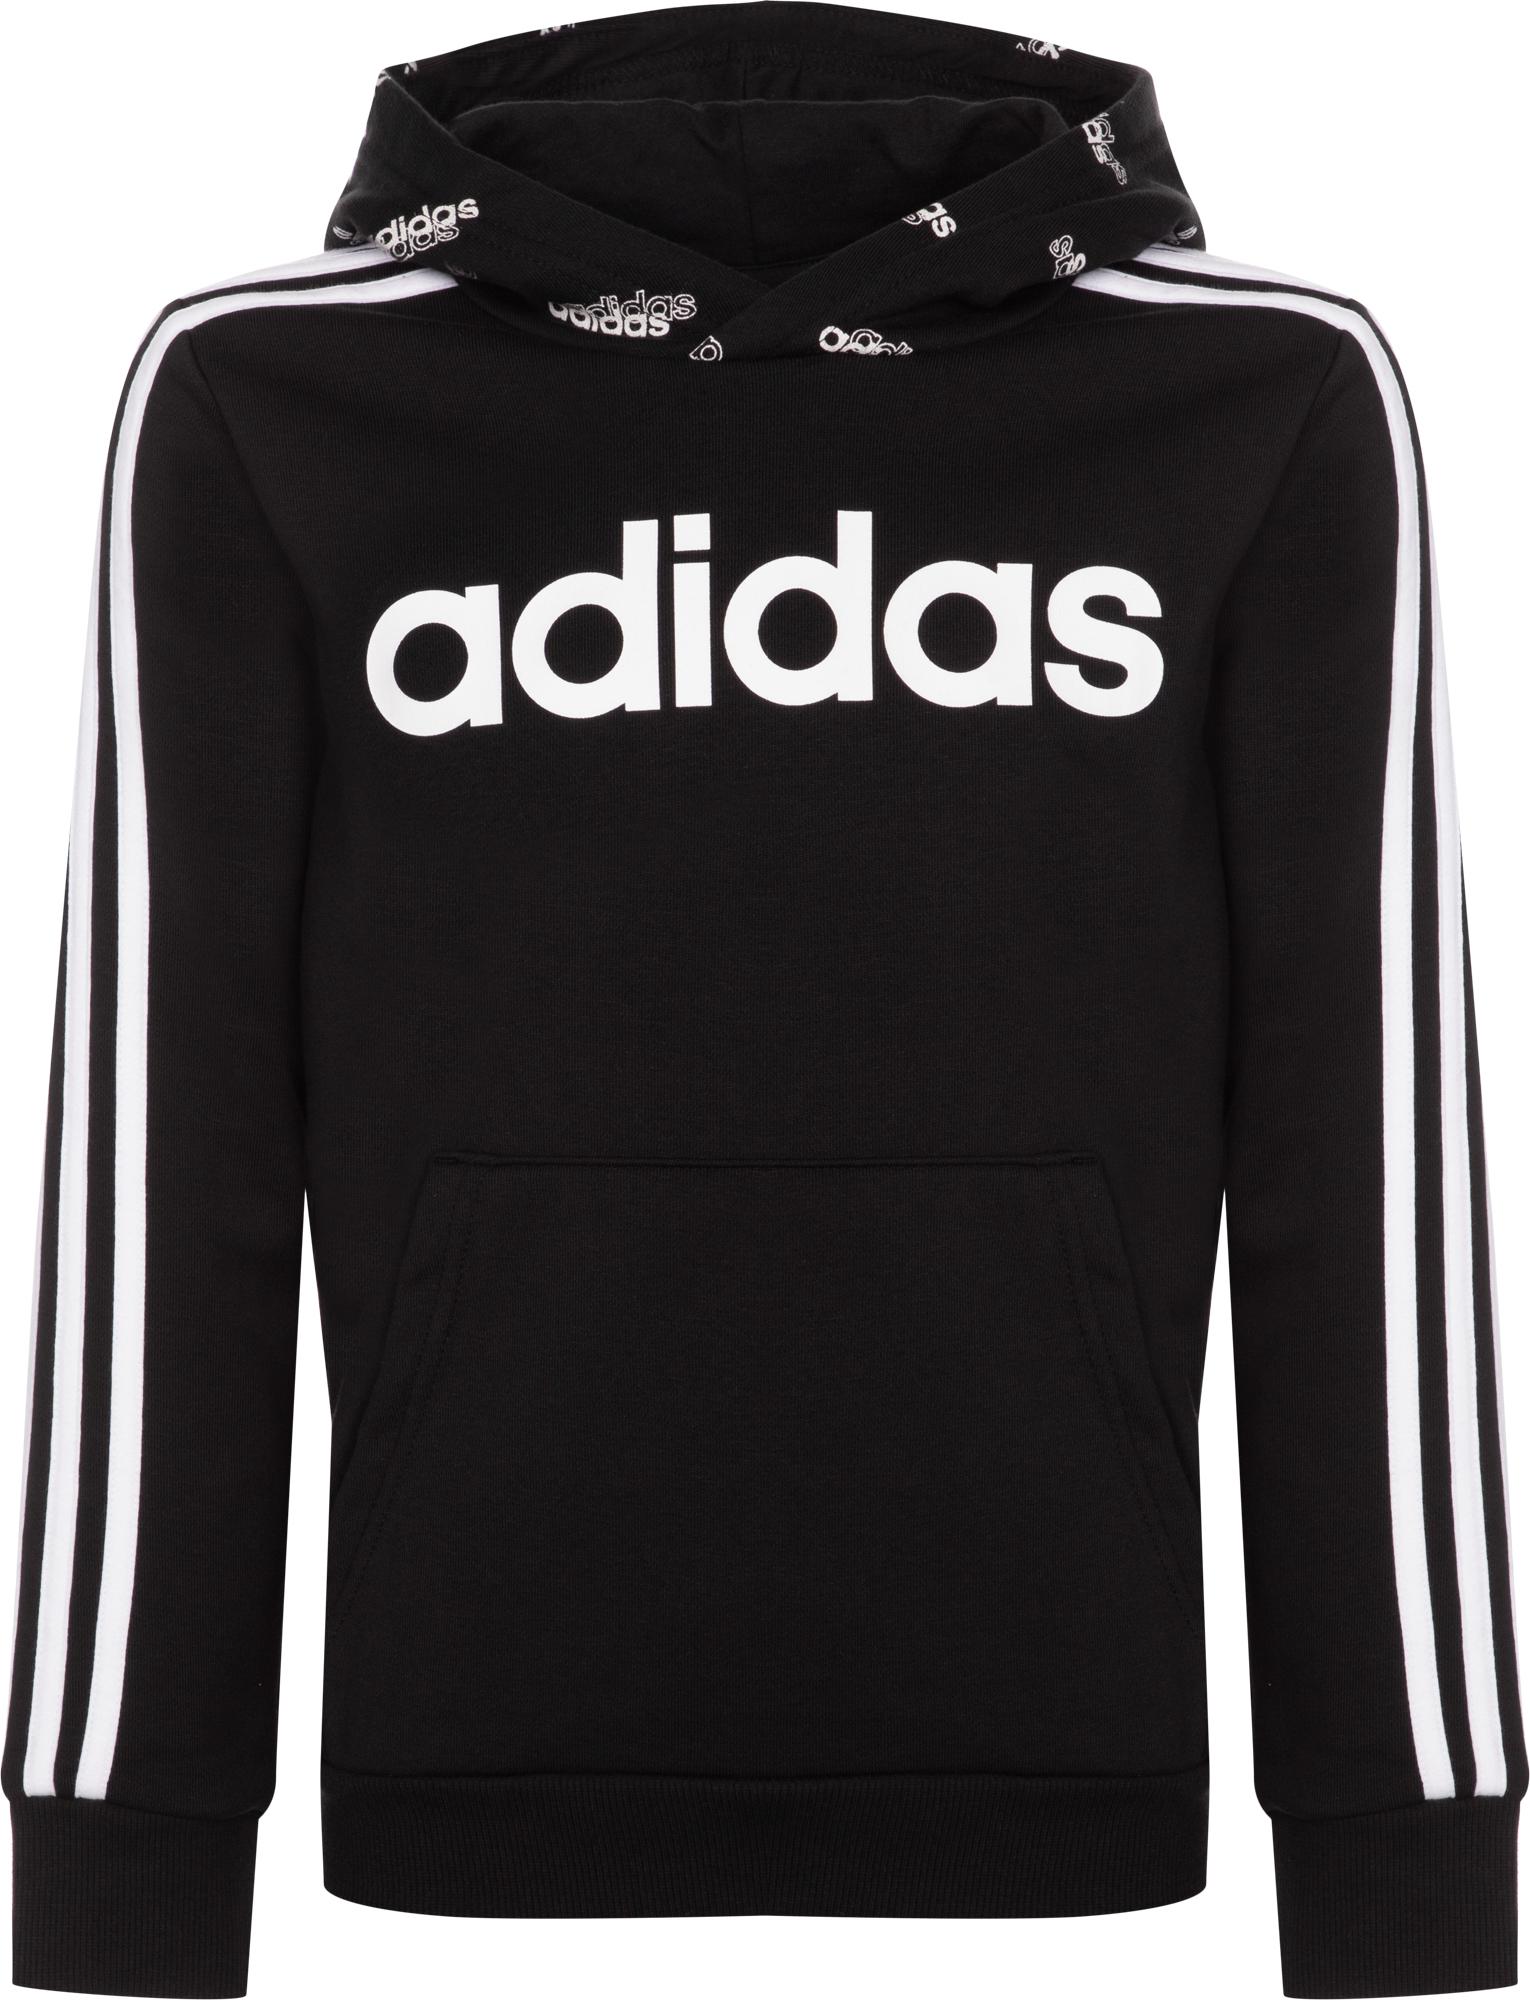 Adidas Худи для мальчиков Adidas, размер 152